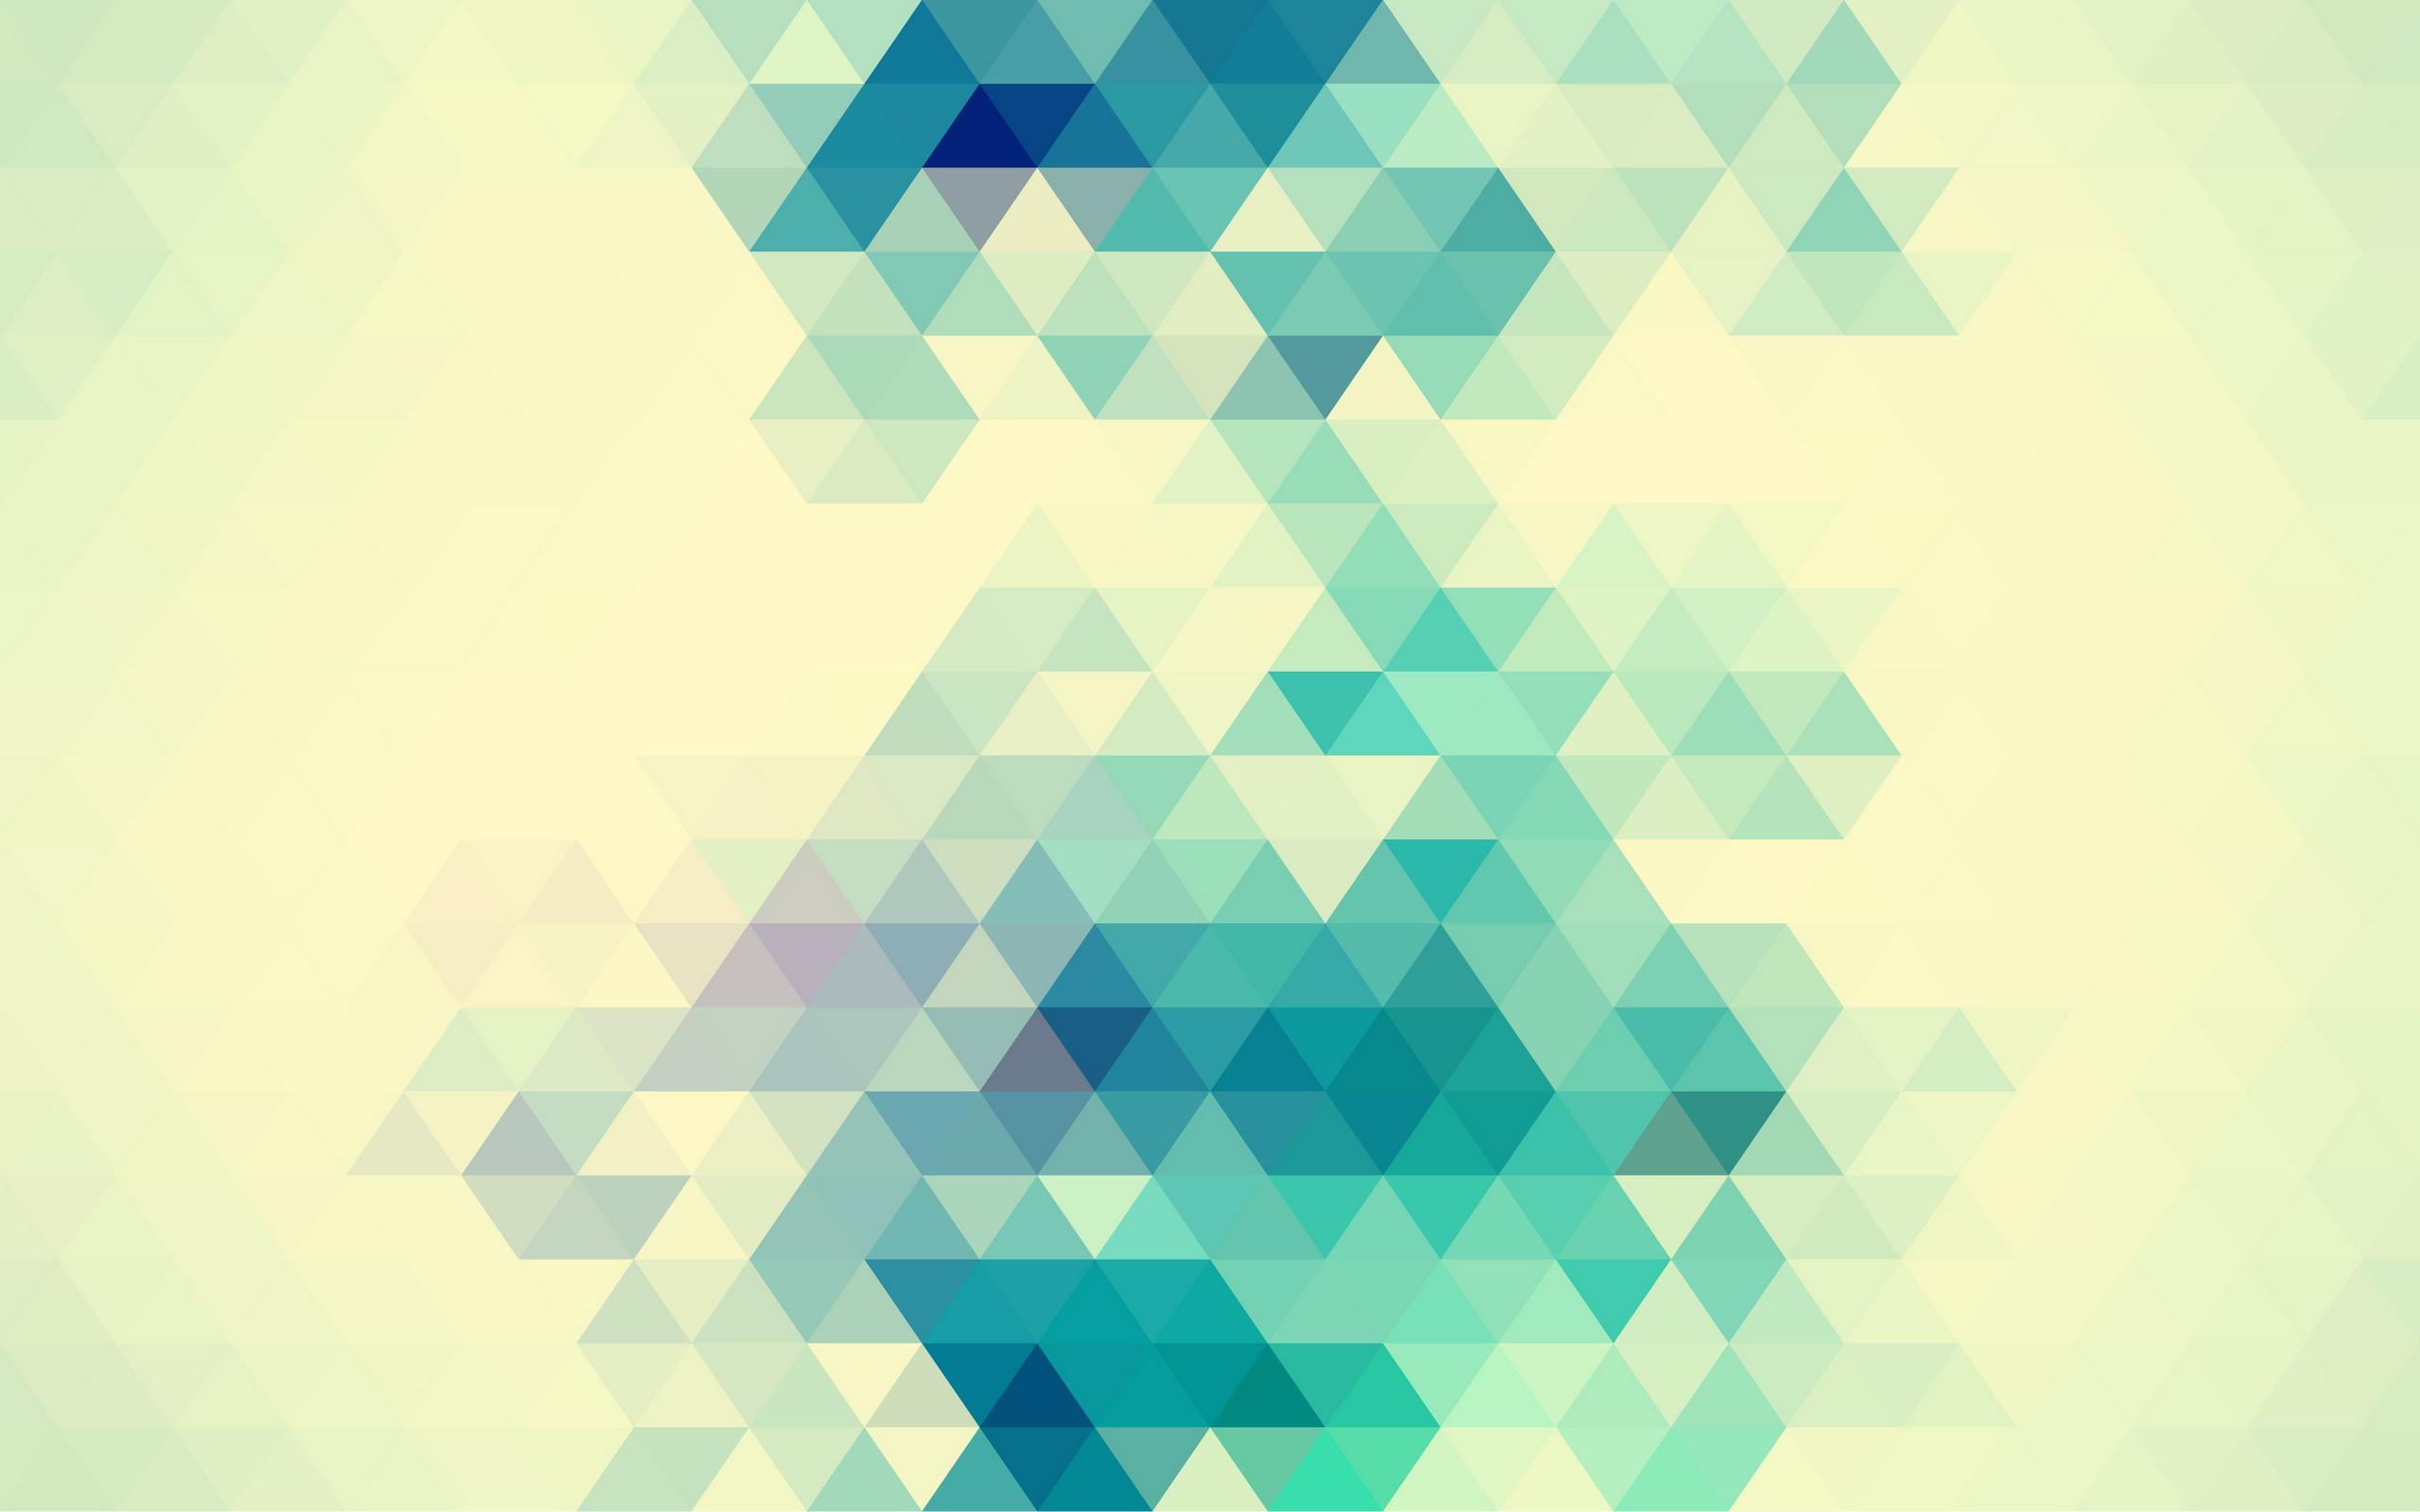 Triangle Fond D Ecran Hd Arriere Plan 2560x1600 Id 592164 Wallpaper Abyss